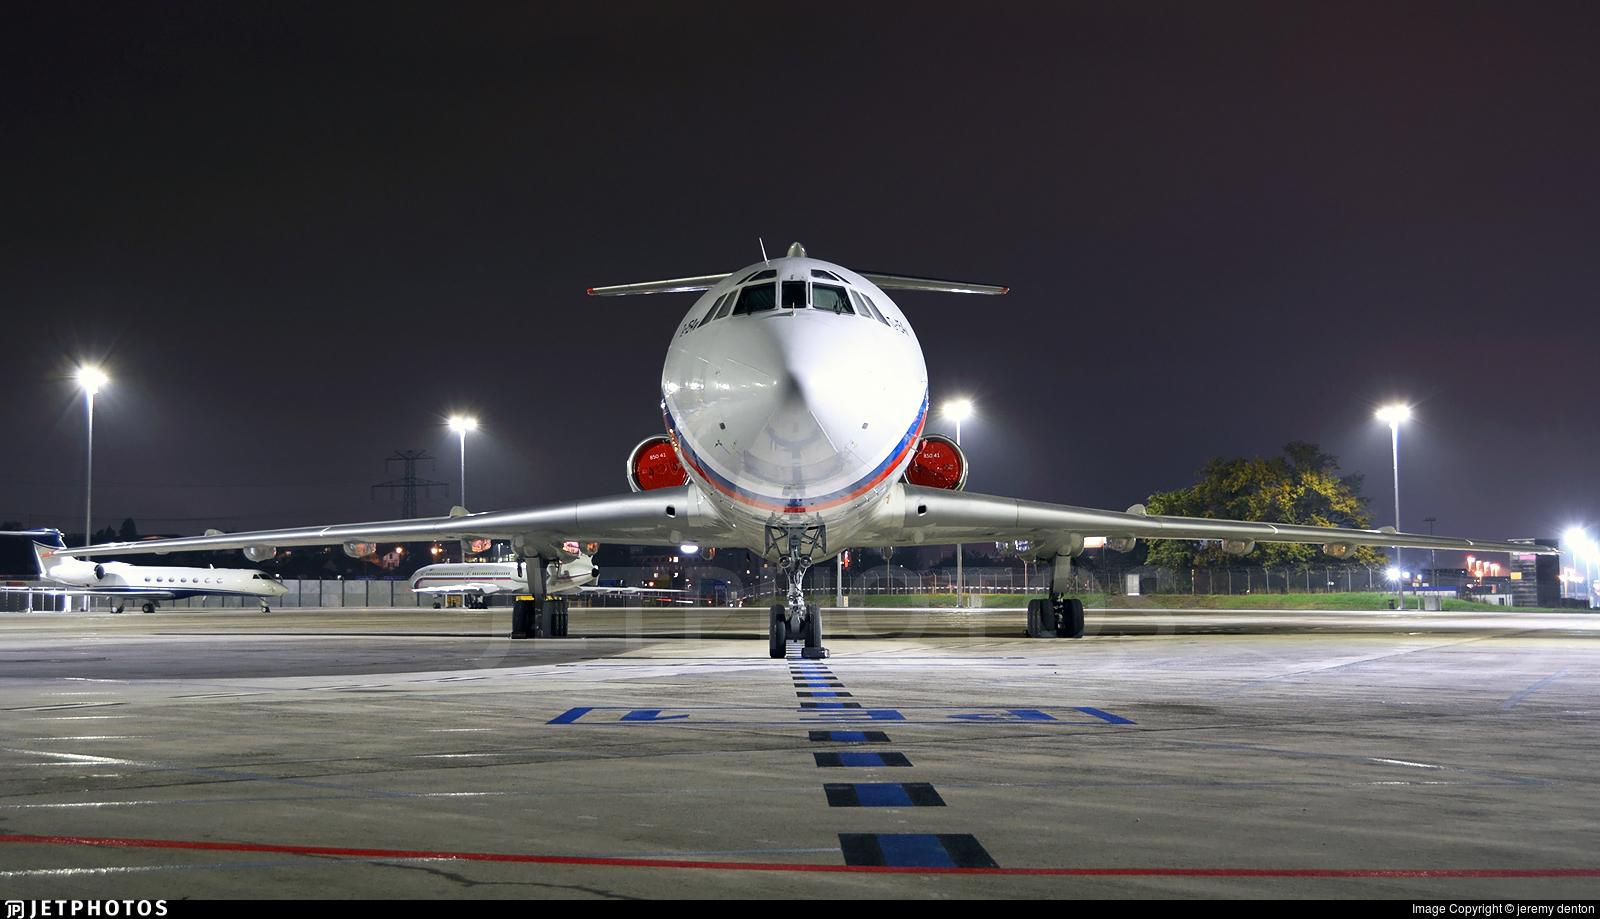 RA-85041 - Tupolev Tu-154M - Russia - Air Force